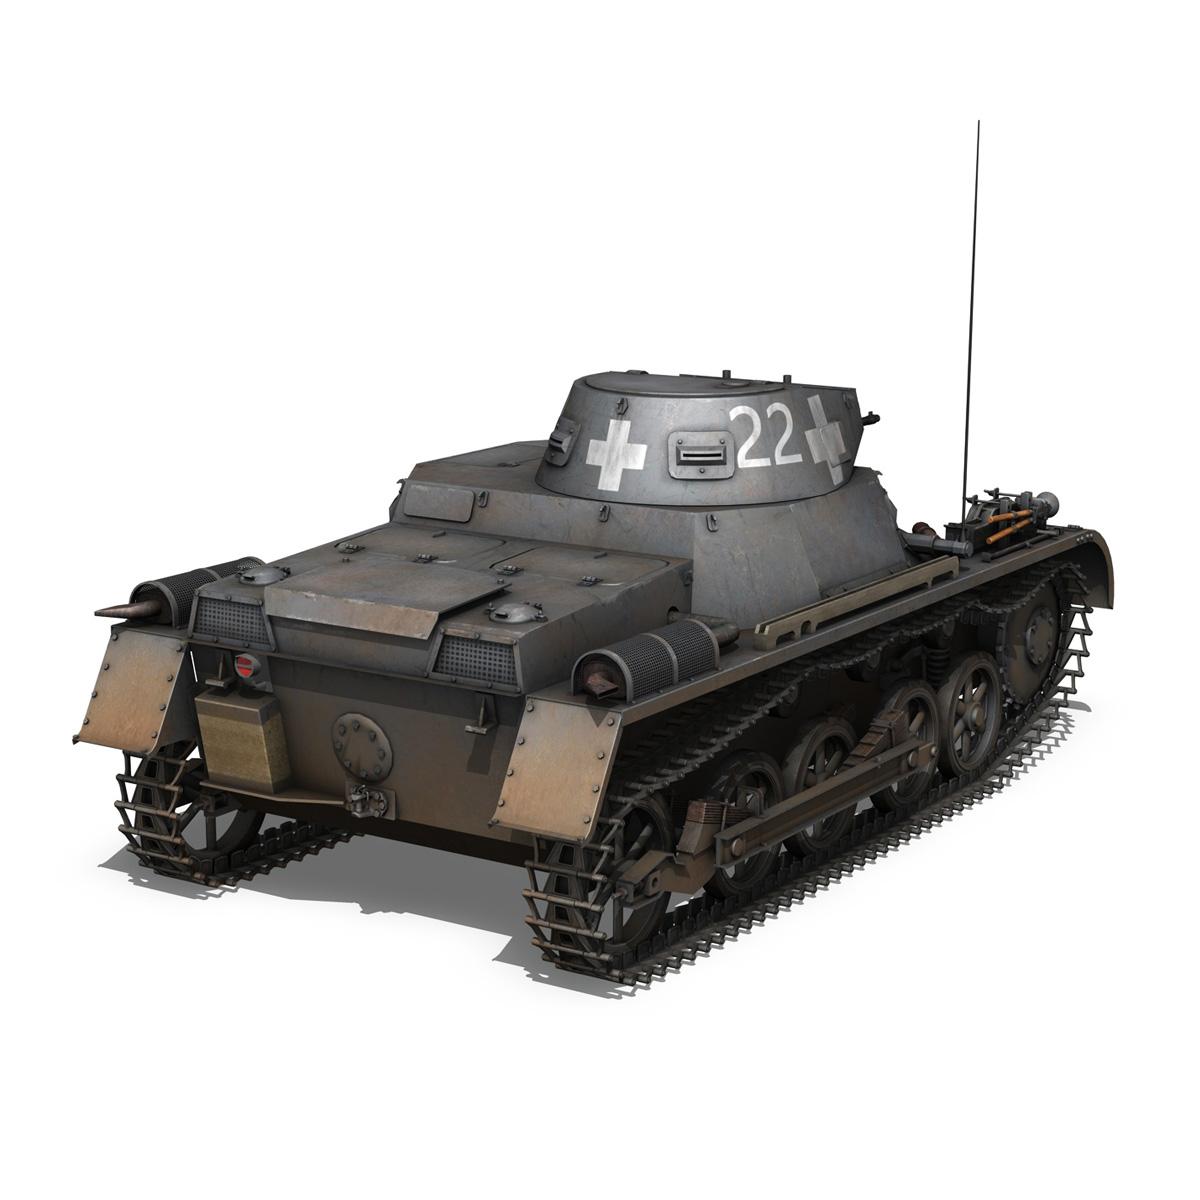 pzkpfw 1 - Panzer 1 - ausf. a - 22 3d modell 3ds fbx c4d lwo obj 186930